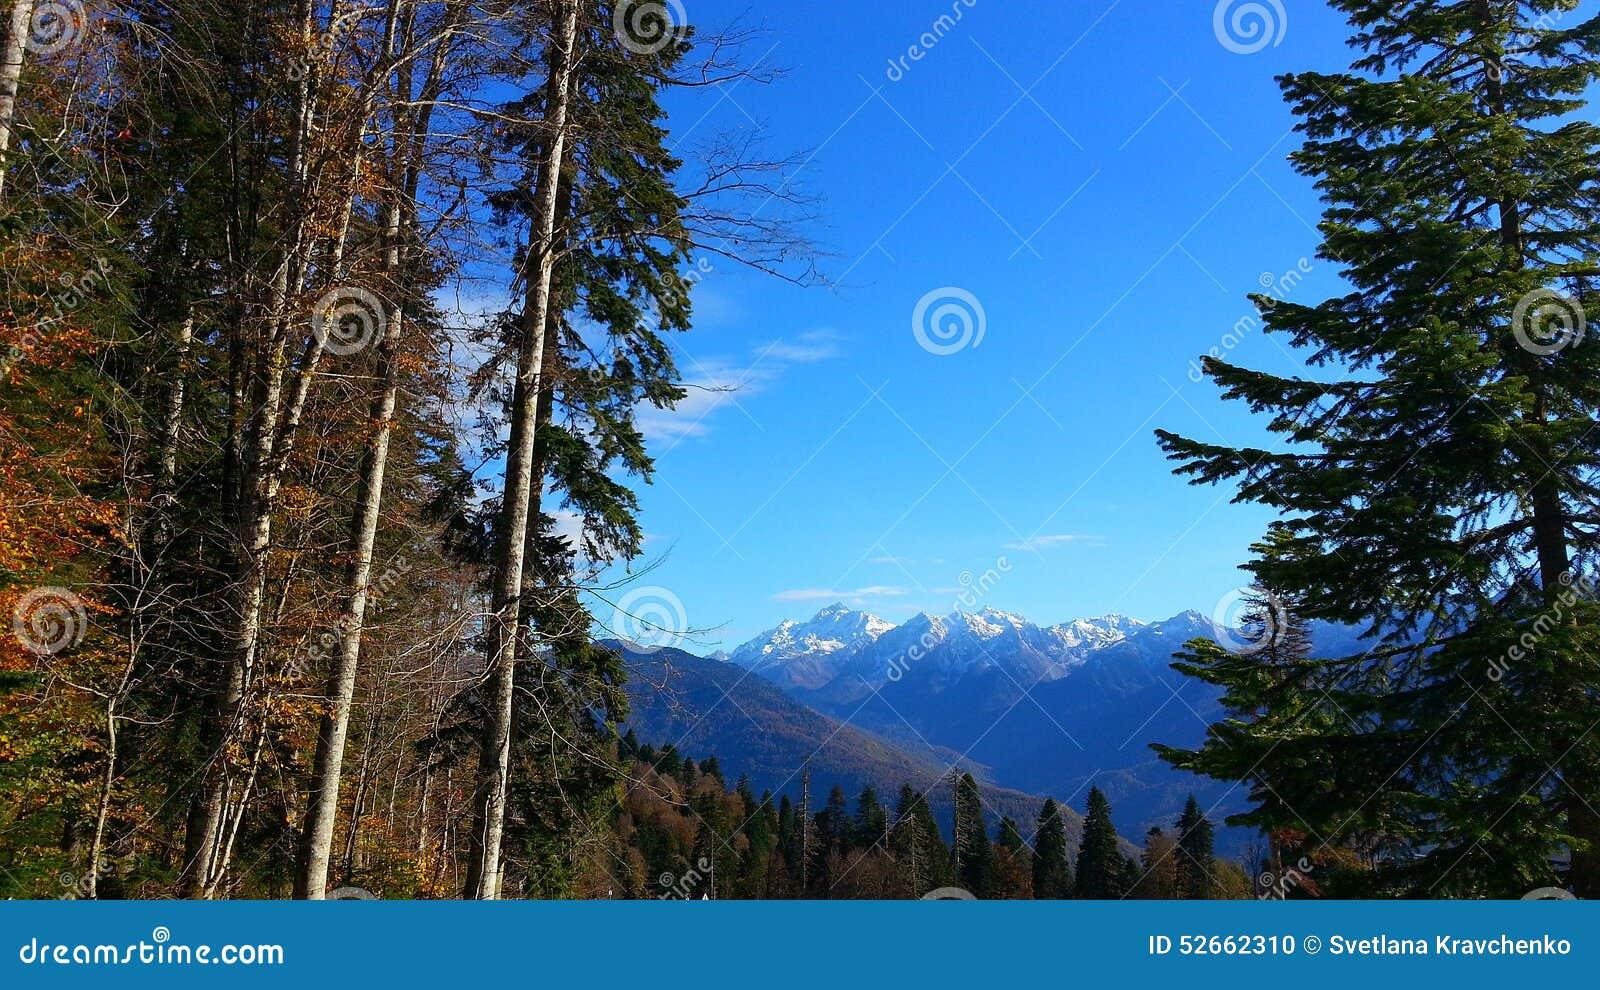 Autumn in the mountains, Krasnaya Polyana, Russia